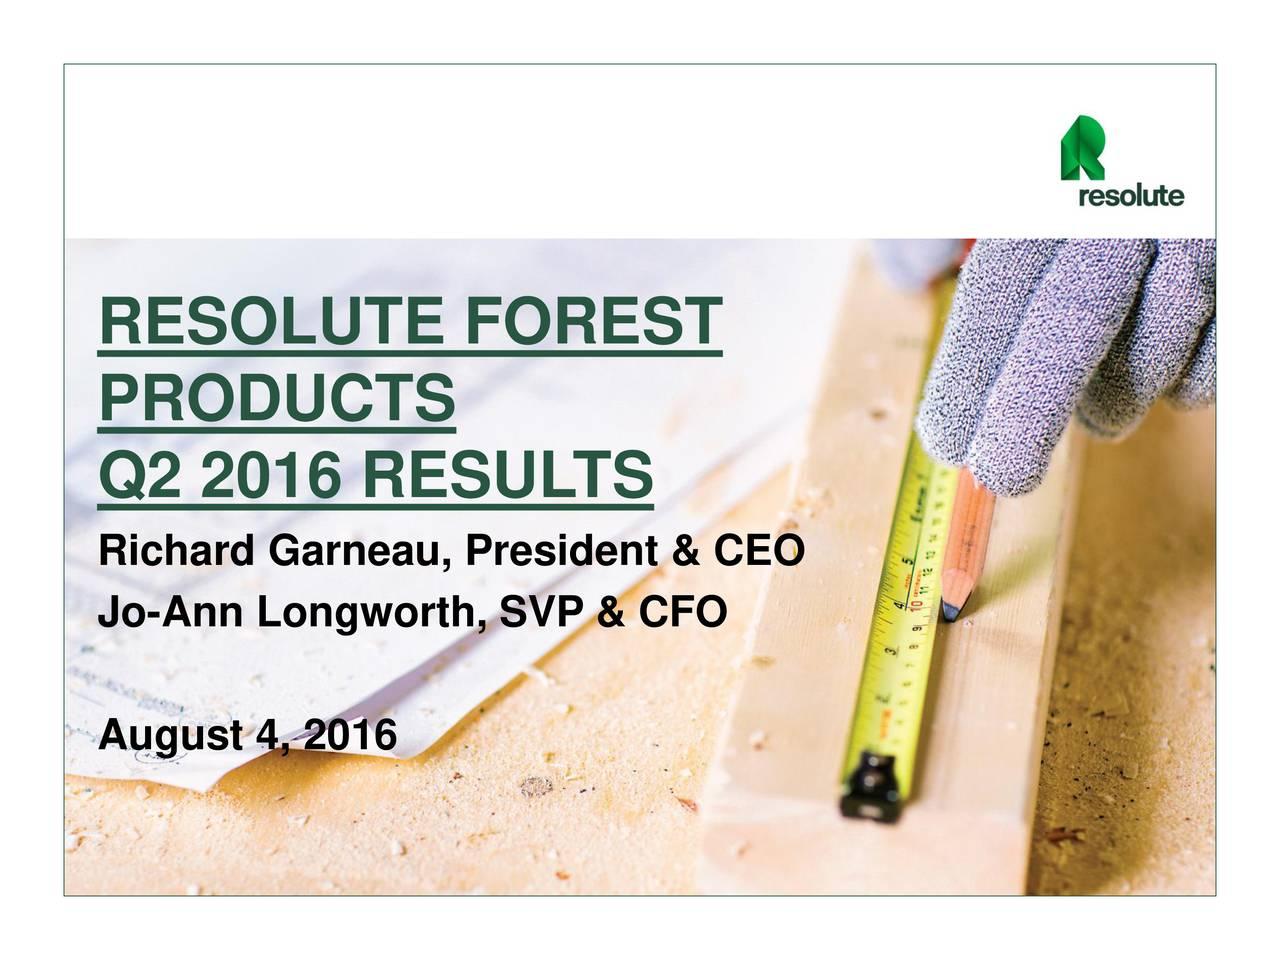 PRODUCTS Q2 2016 RESULTS Richard Garneau, President & CEO Jo-Ann Longworth, SVP & CFO August 4, 2016